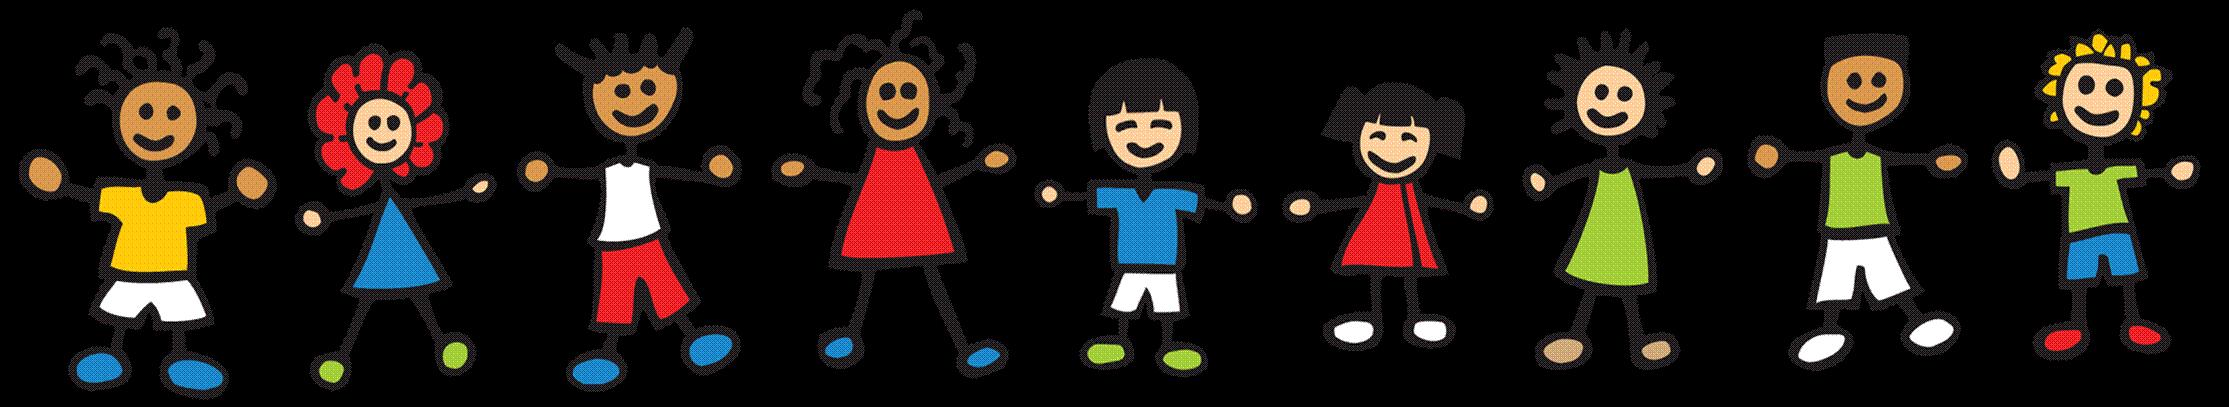 Health clipart children's. Child and adolescent mental